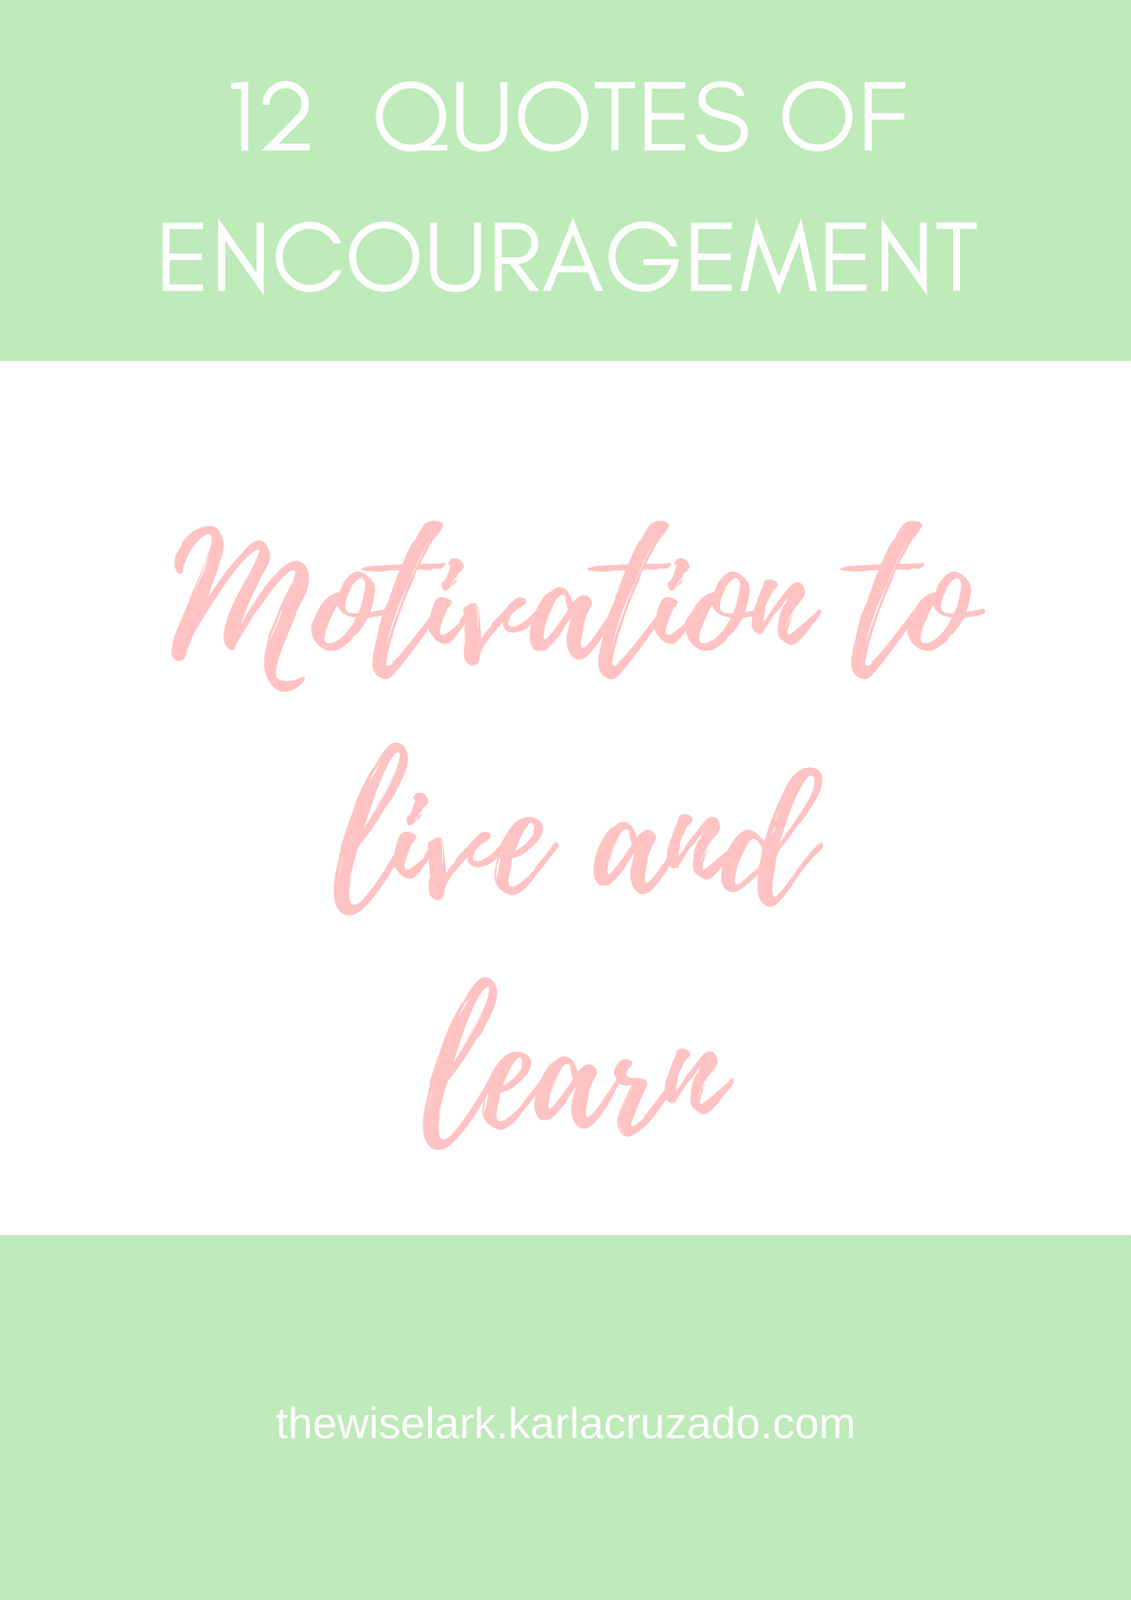 12 inspiring quotes